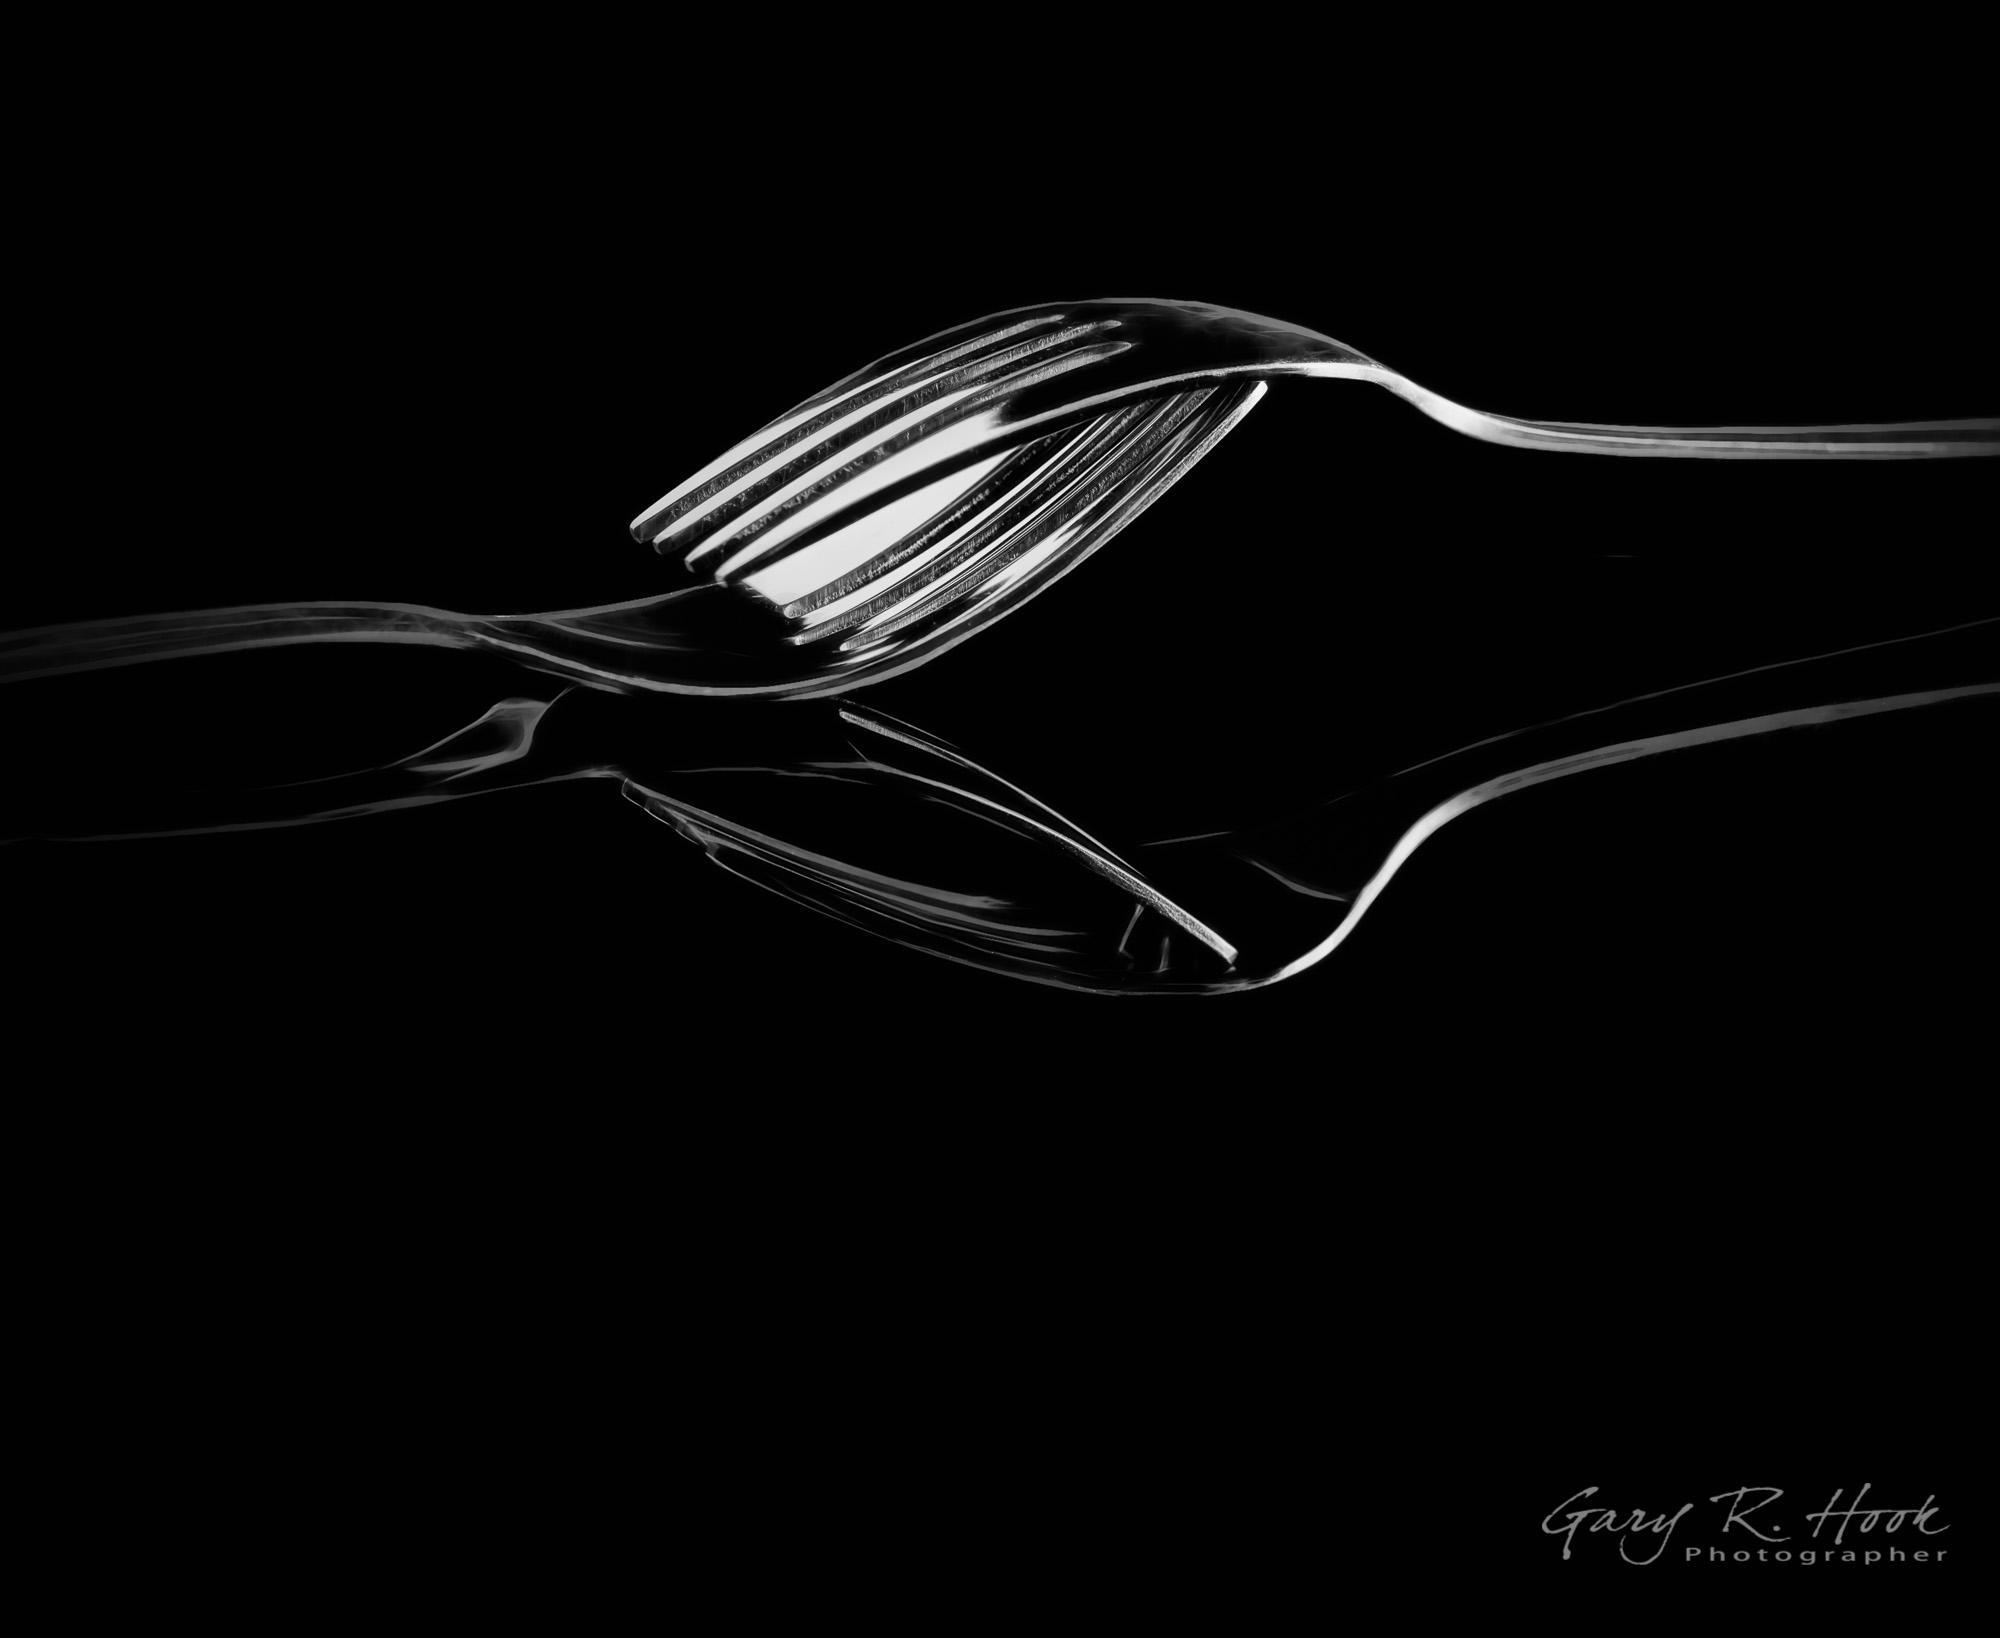 Light Study: Forks